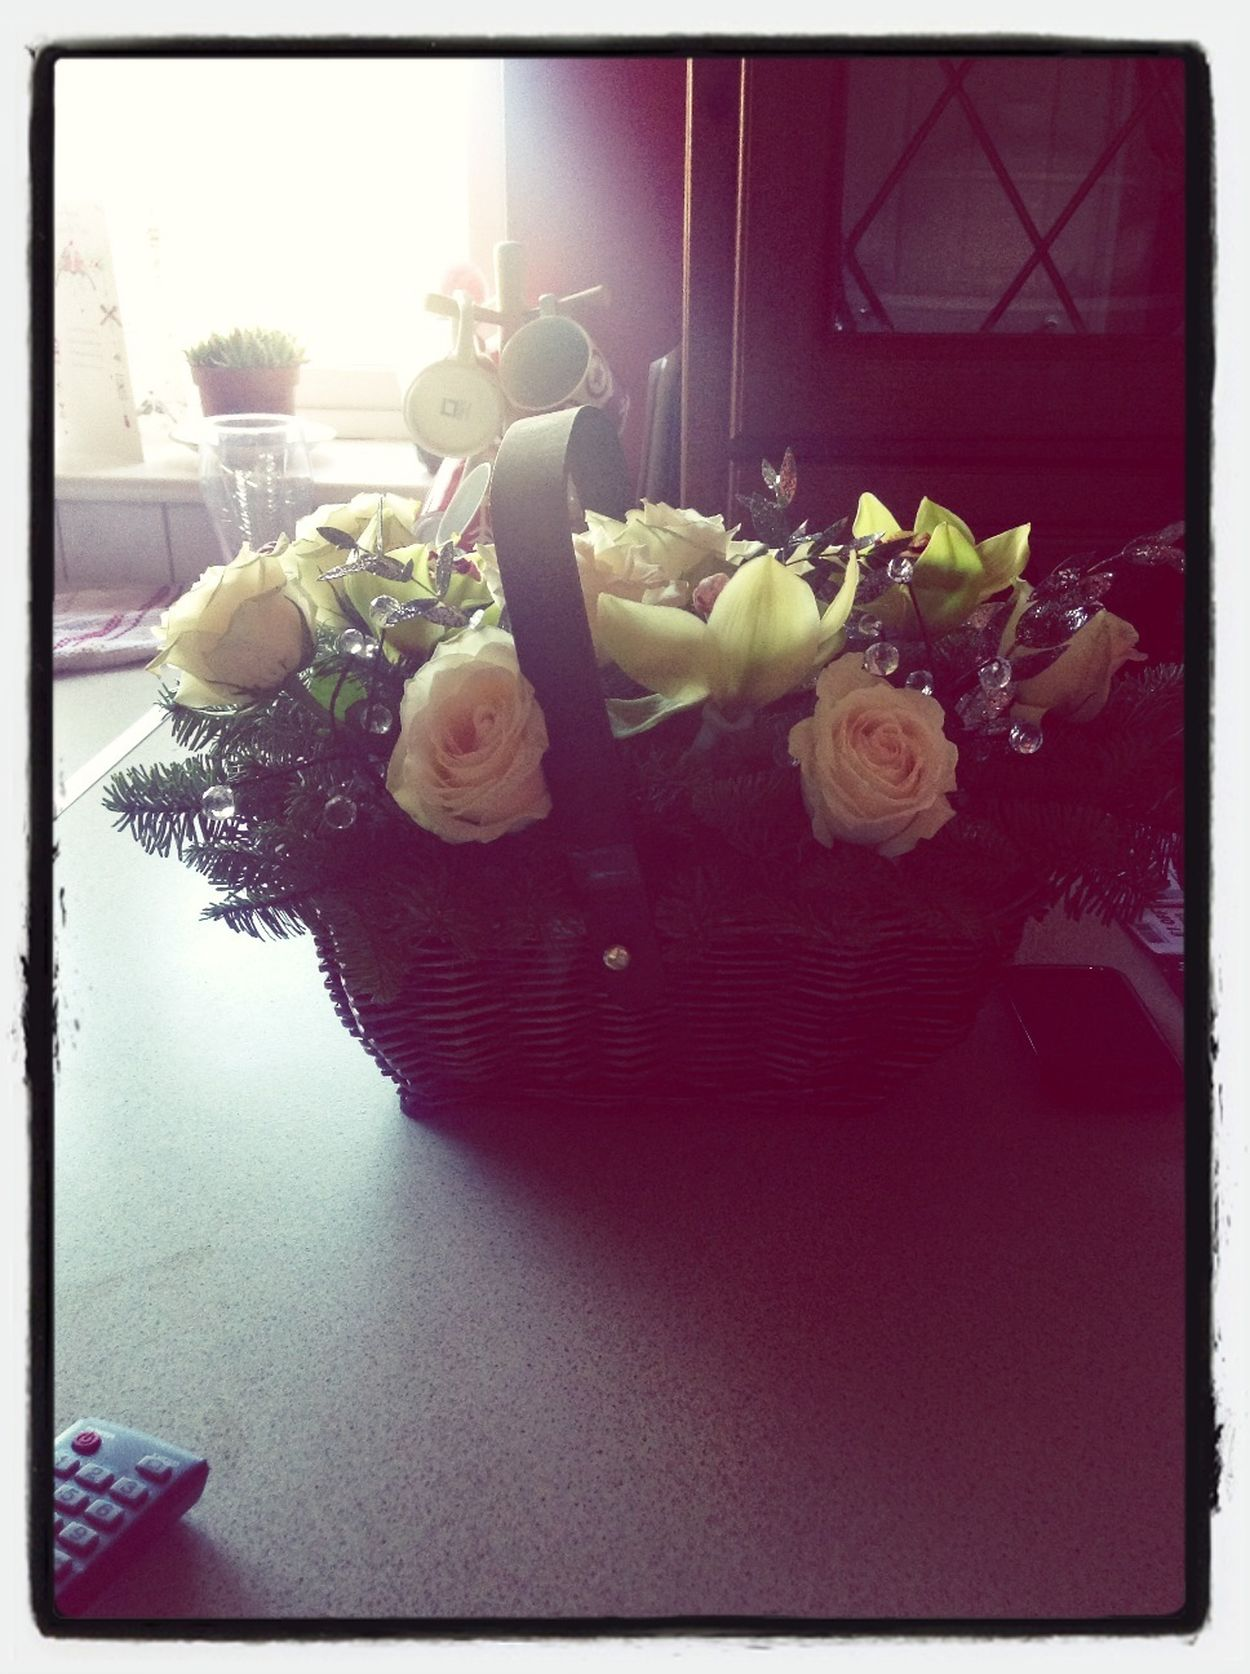 Christmas flowers! Happy Christmas EyeEm :)